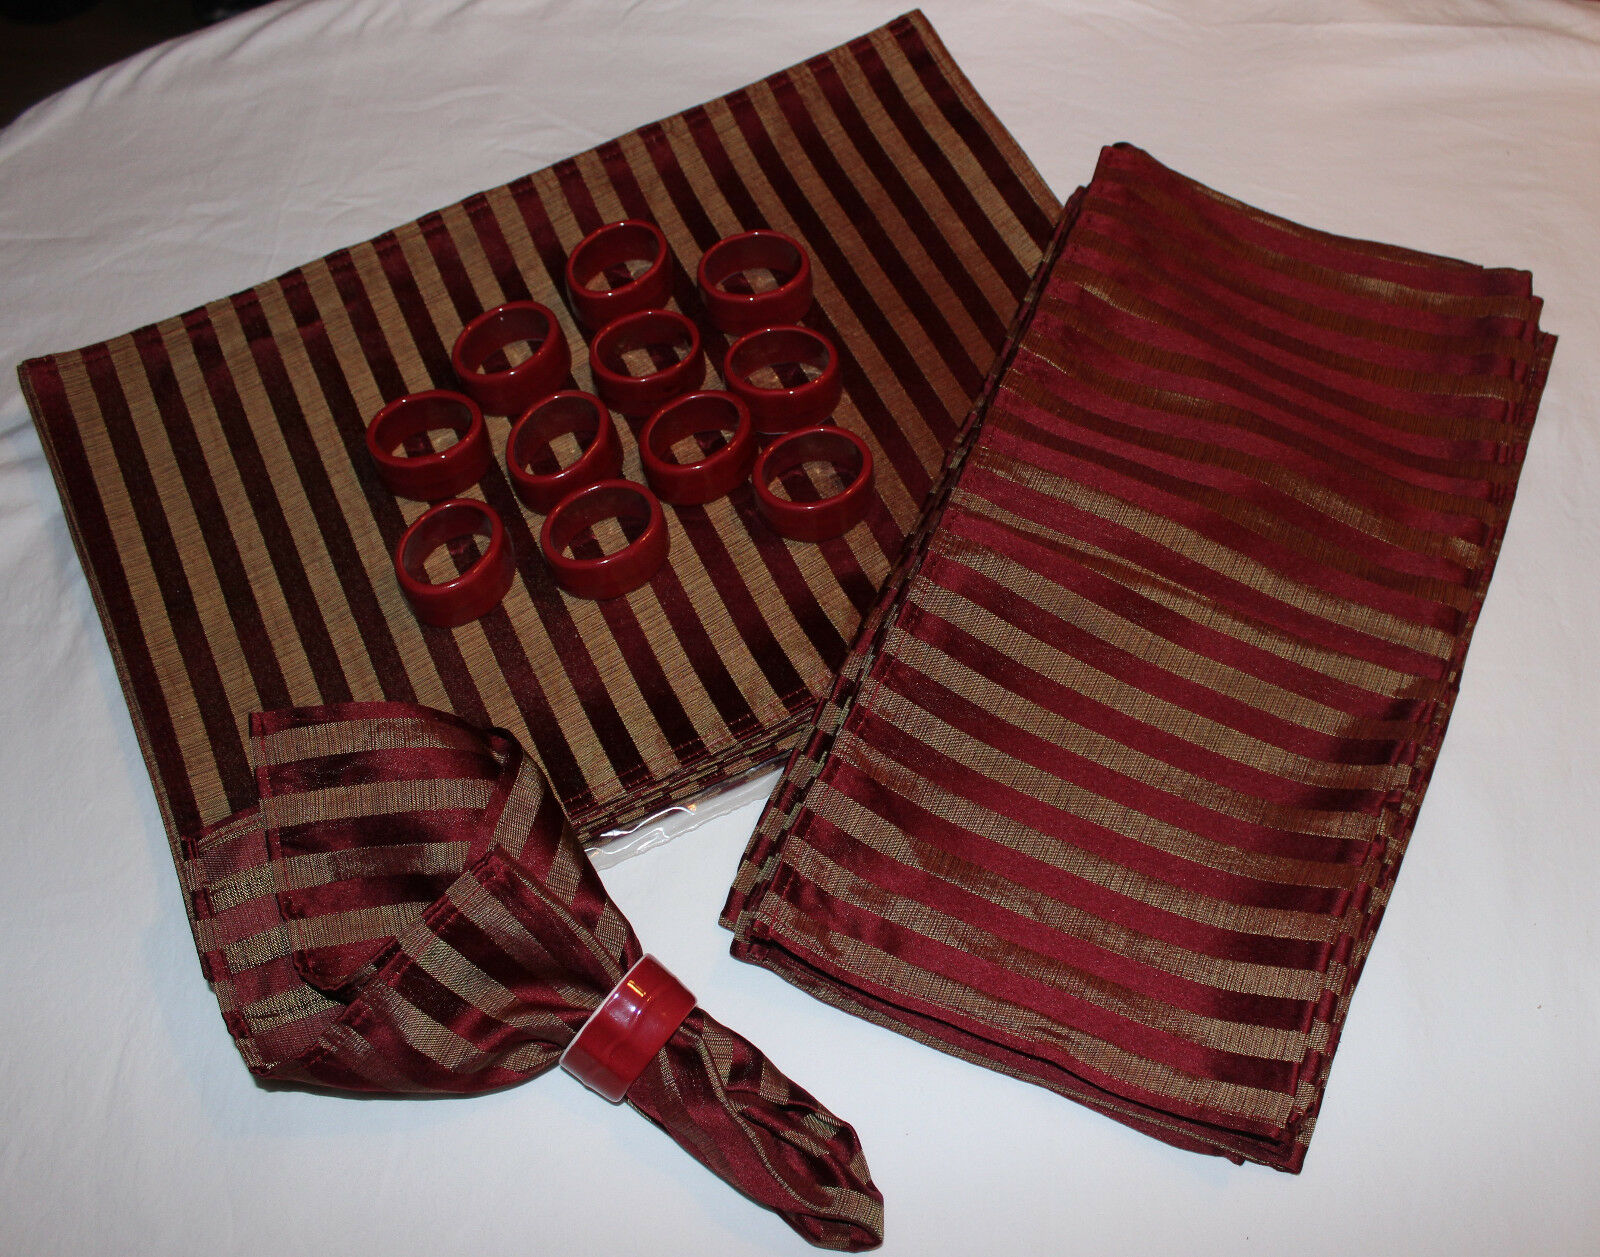 Service for 12 Burgundy & Gold Stripe Placemats Linen Napkins Napkins Napkins & Ring Holders 0ab060